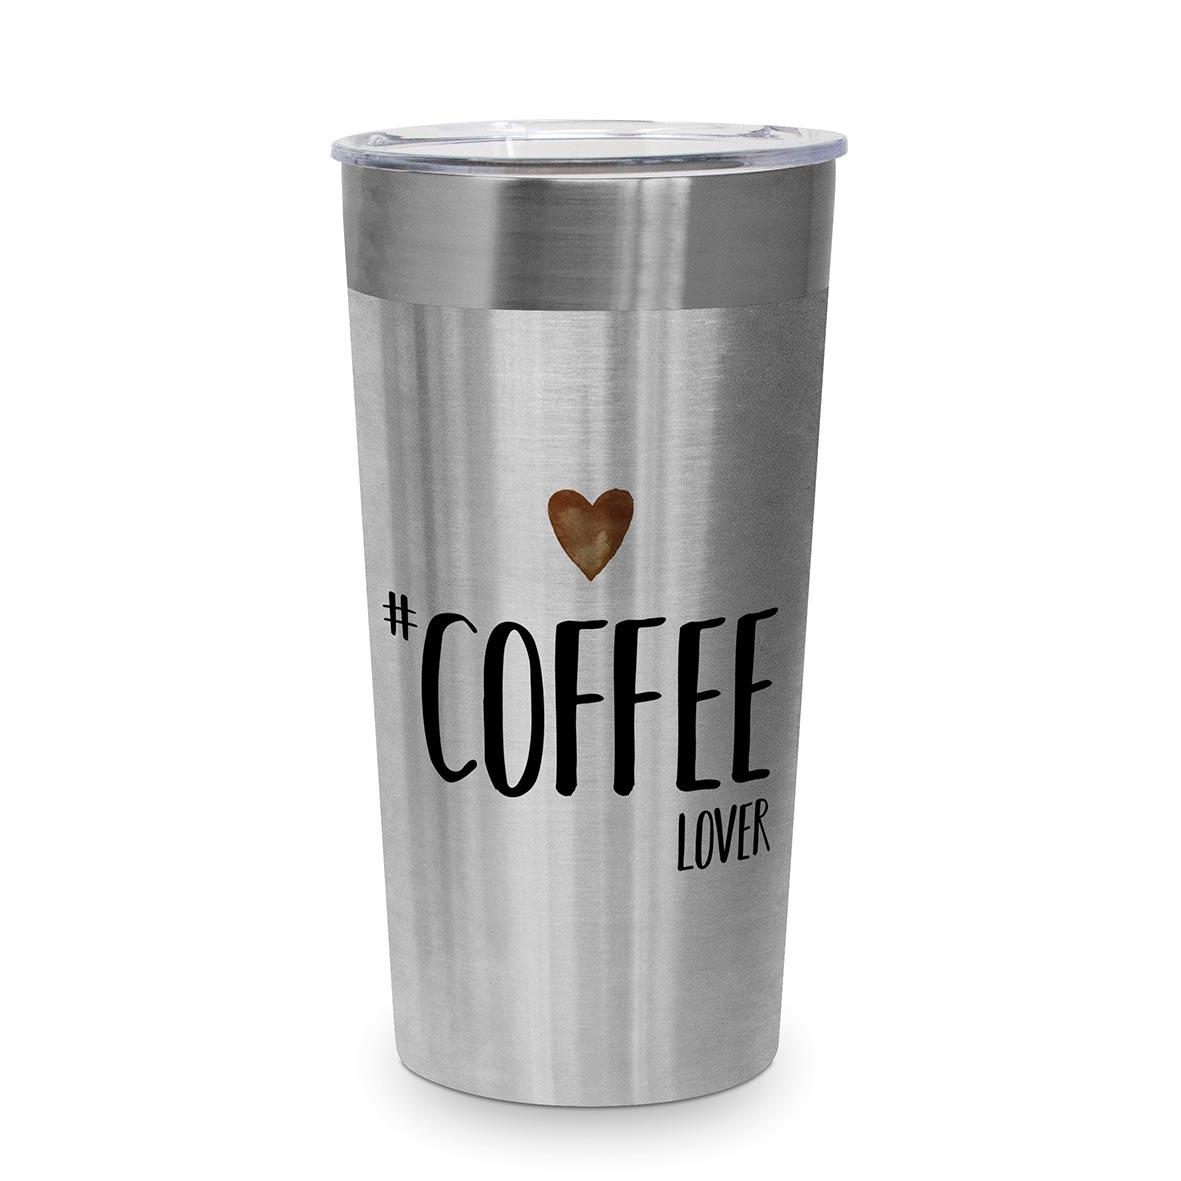 Coffee Lover Steel Travel Mug